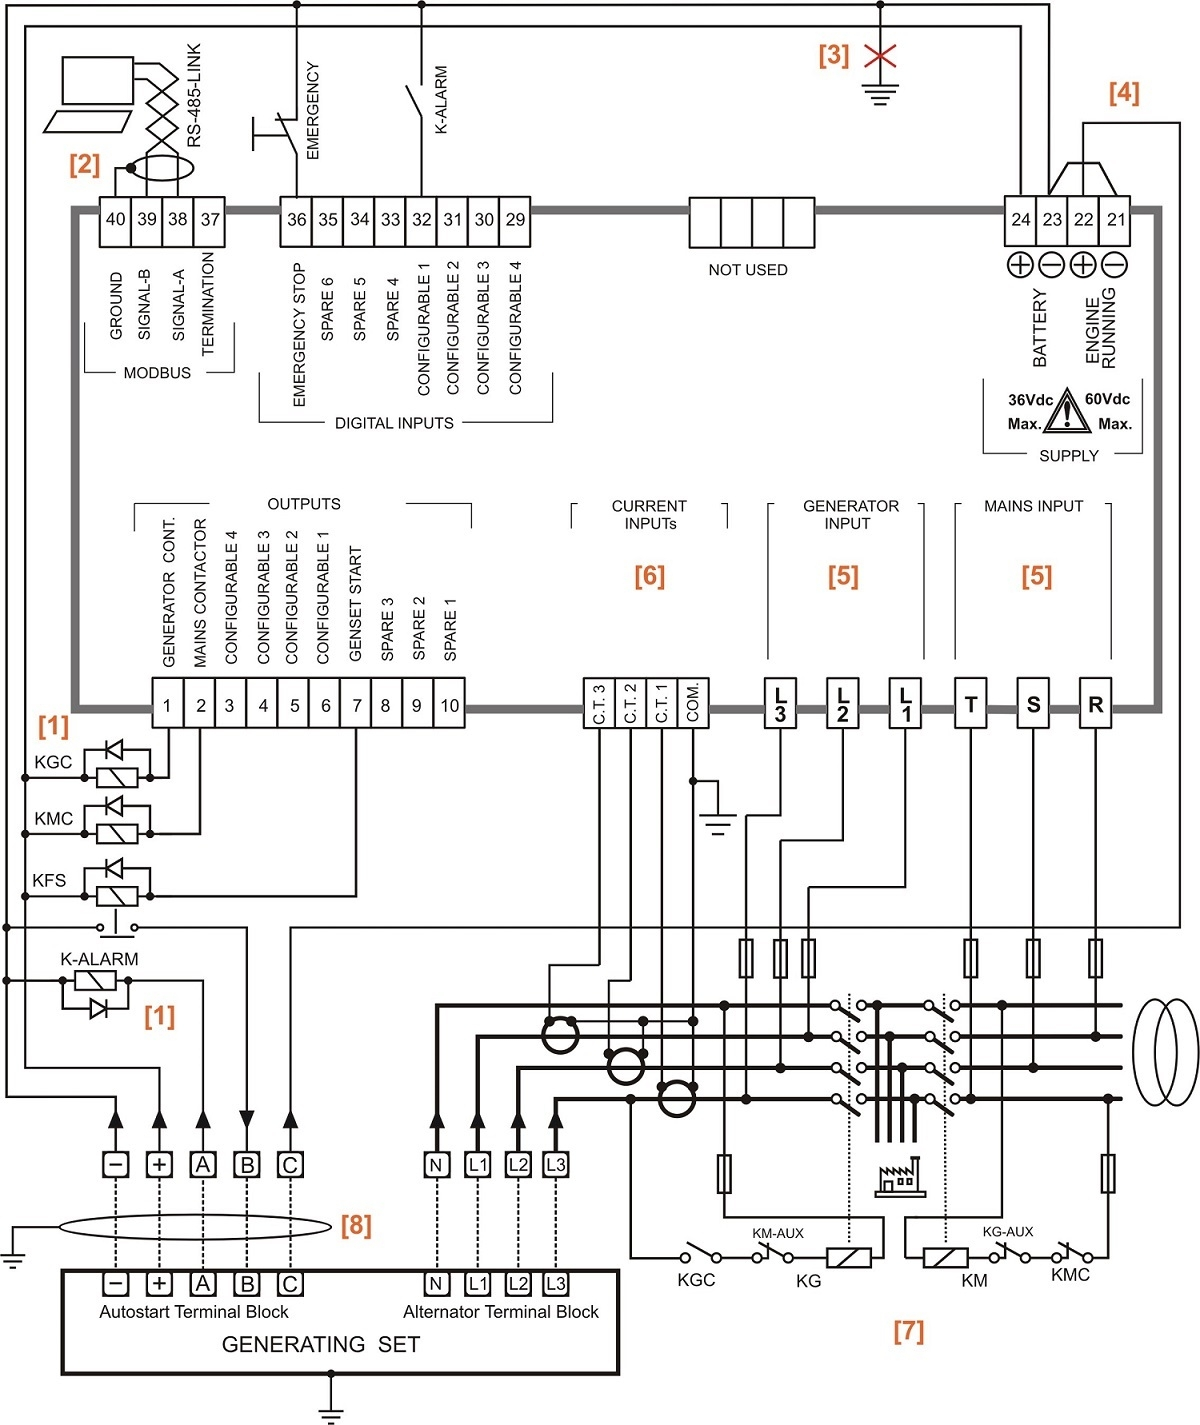 hight resolution of generac transfer switch wiring diagram wiring diagram 30 transfer switch air pressor wiring diagram autocad